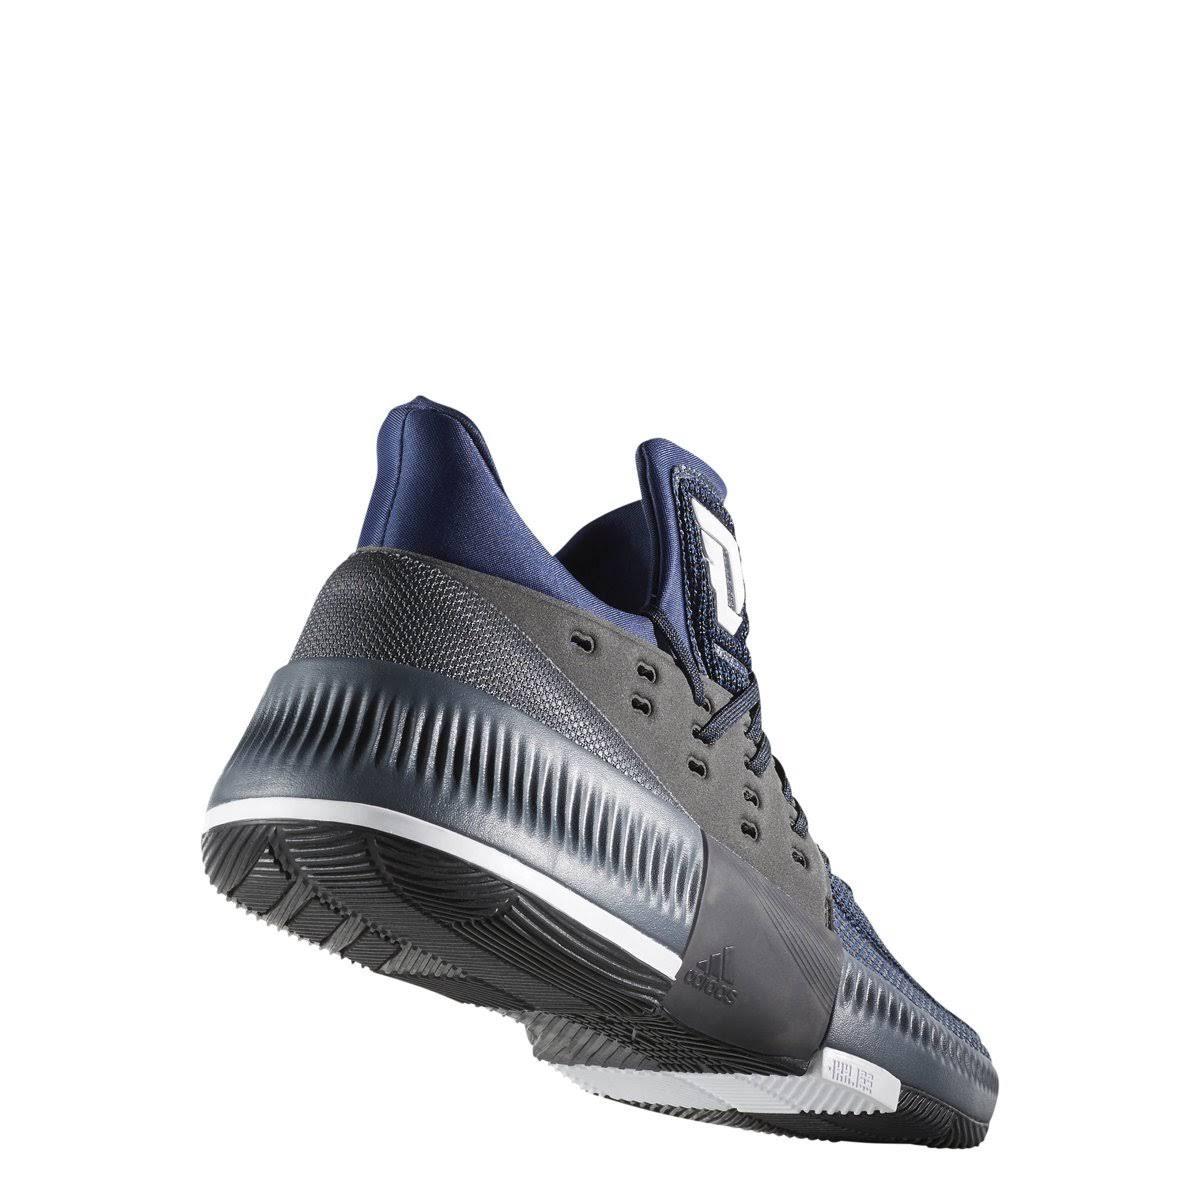 Deporte Para 3 5 Lillard Tamaño Us 8 Dame Hombre Basketball Bb8271 Zapatillas De Adidas D f78qn5U0